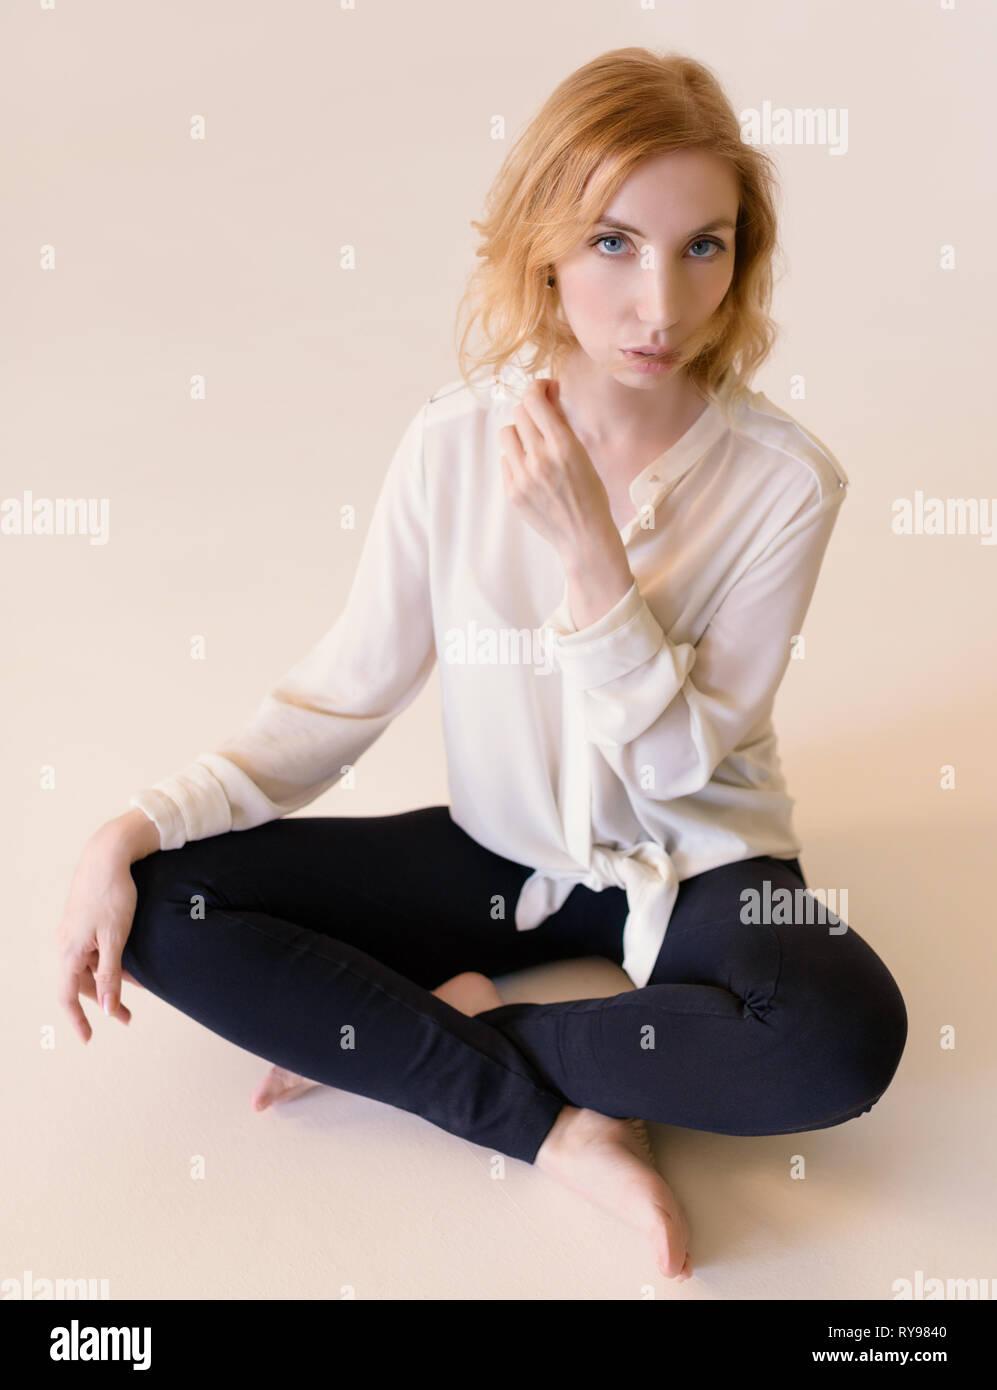 Beautiful woman in black leggings on beige background. - Stock Image